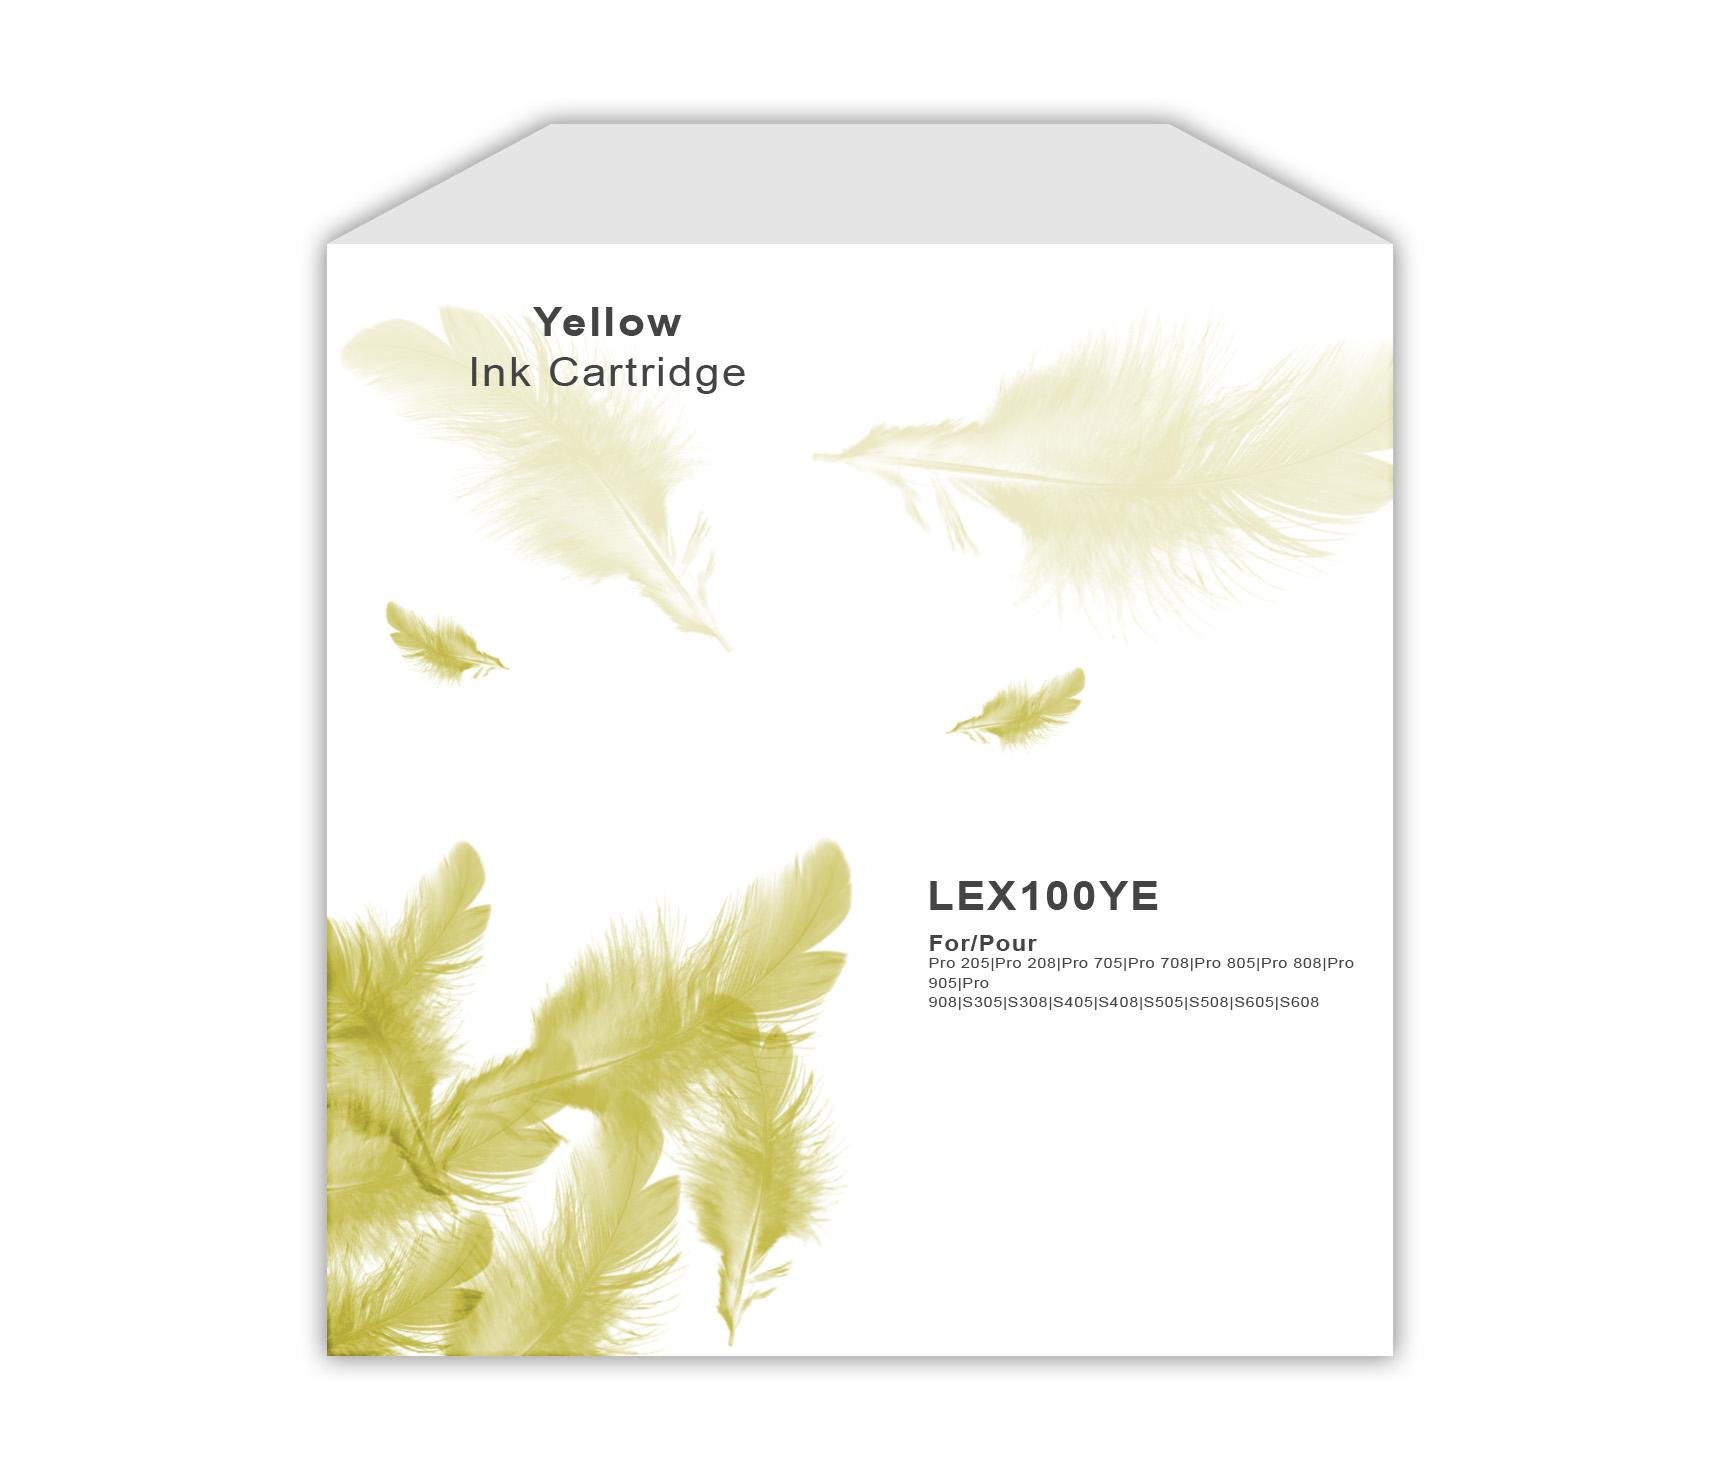 Lexmark 100 Yellow Ink Cartridge